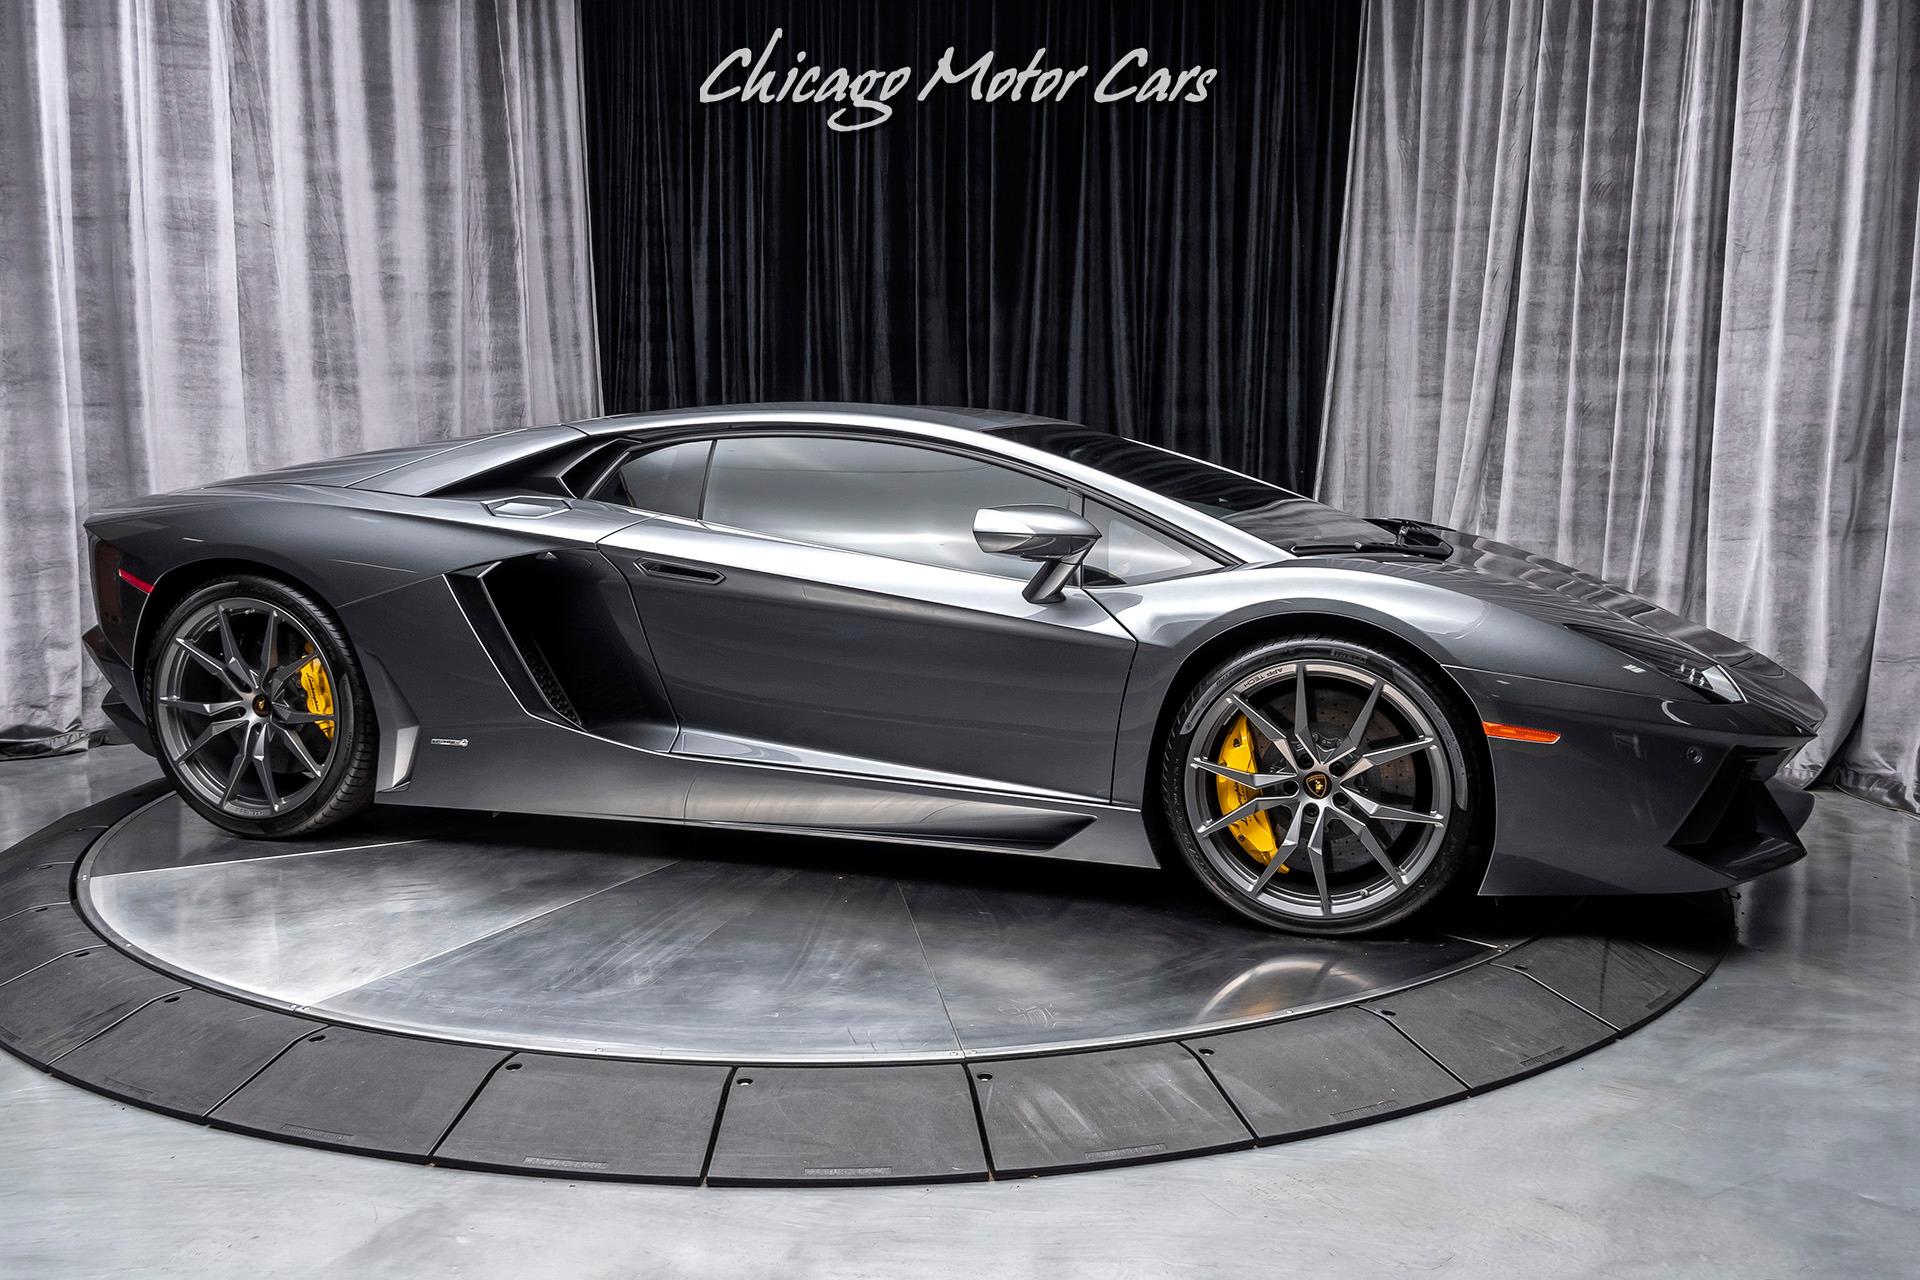 Used-2015-Lamborghini-Aventador-LP700-4-Coupe-Original-MSRP-458k